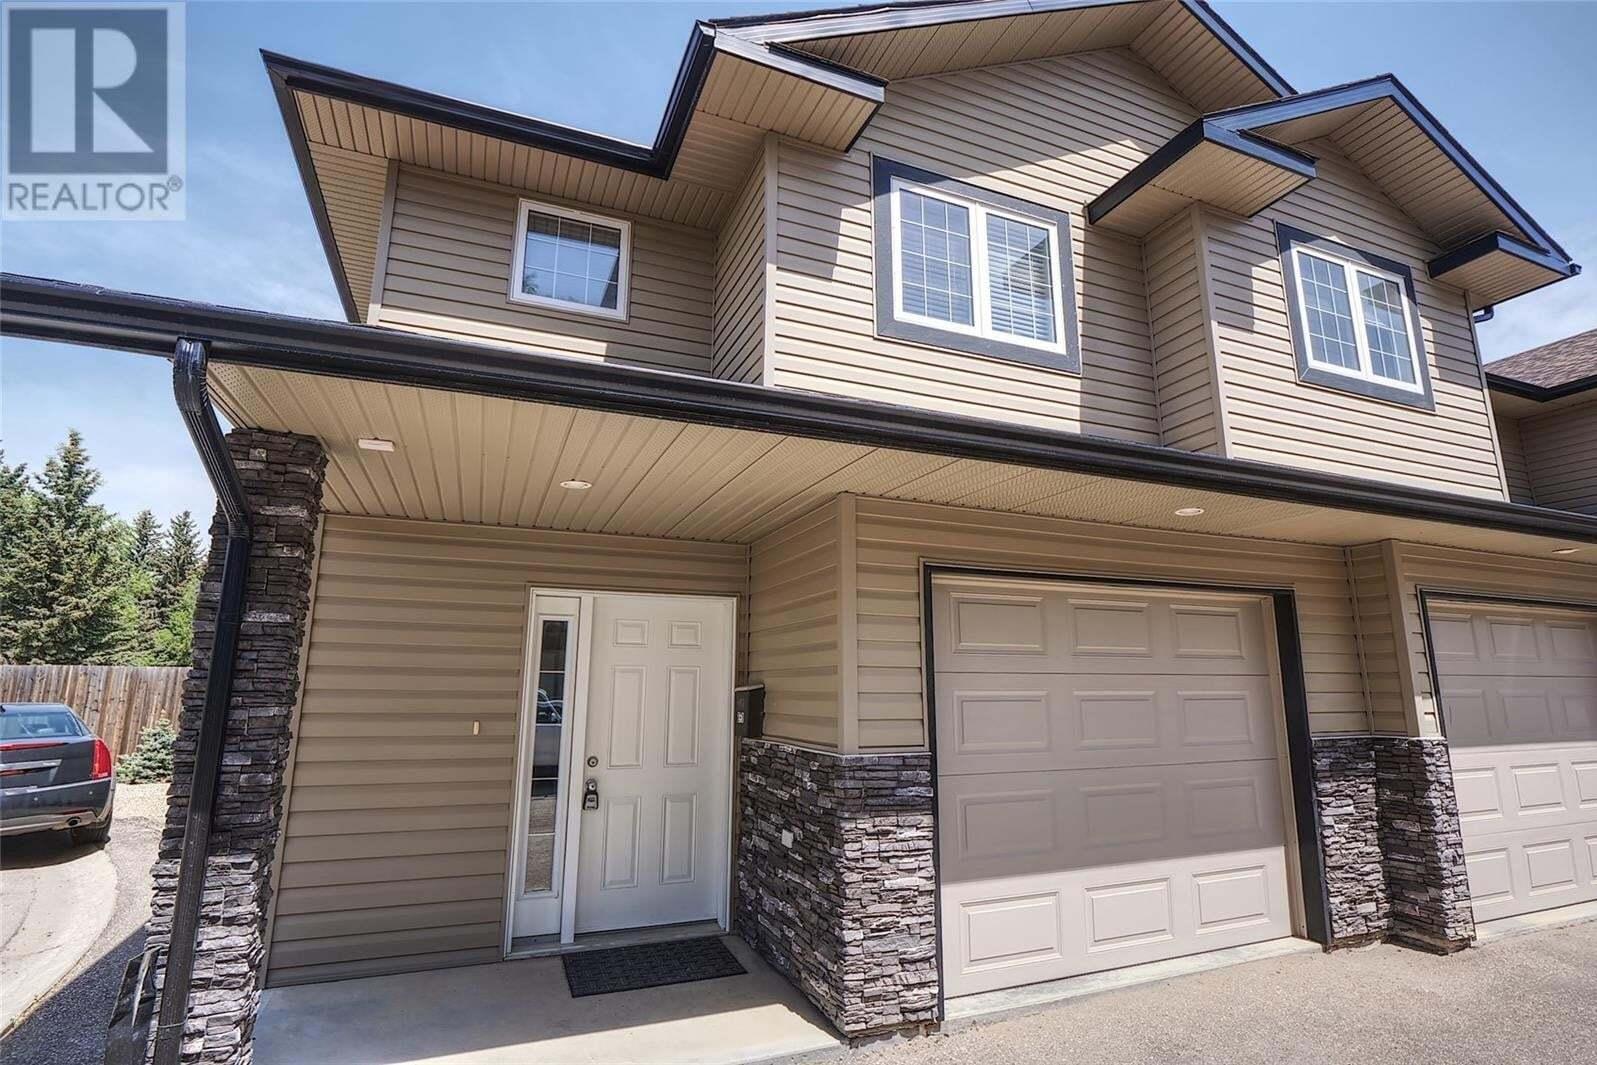 Townhouse for sale at 33 Wood Lily Dr Unit E1 Moose Jaw Saskatchewan - MLS: SK810258